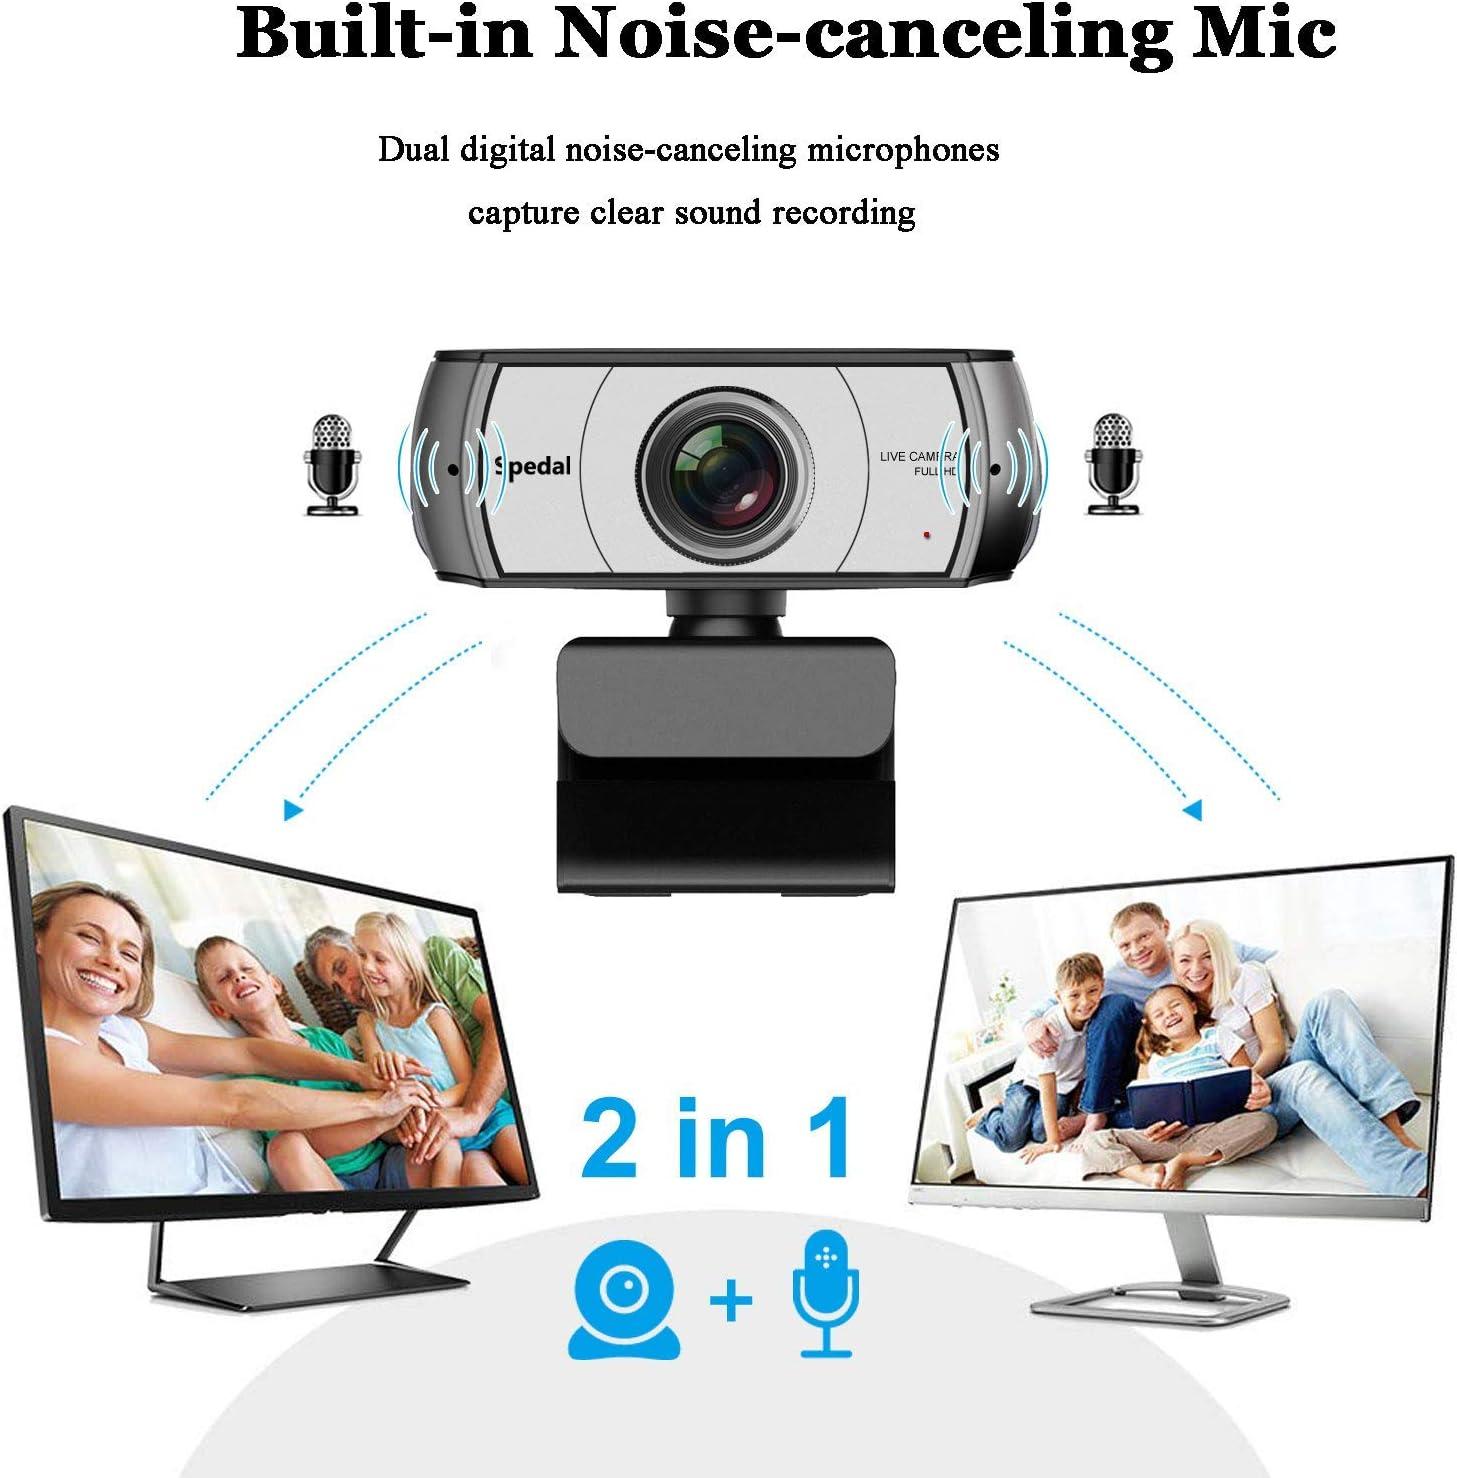 Webcam 120° Gran Angular Full HD 1080P Cámara Web Compatible con Skype,Xbox, Twitch,Youtube, Facebook Webcam de USB Plug and Play: Amazon.es: Electrónica